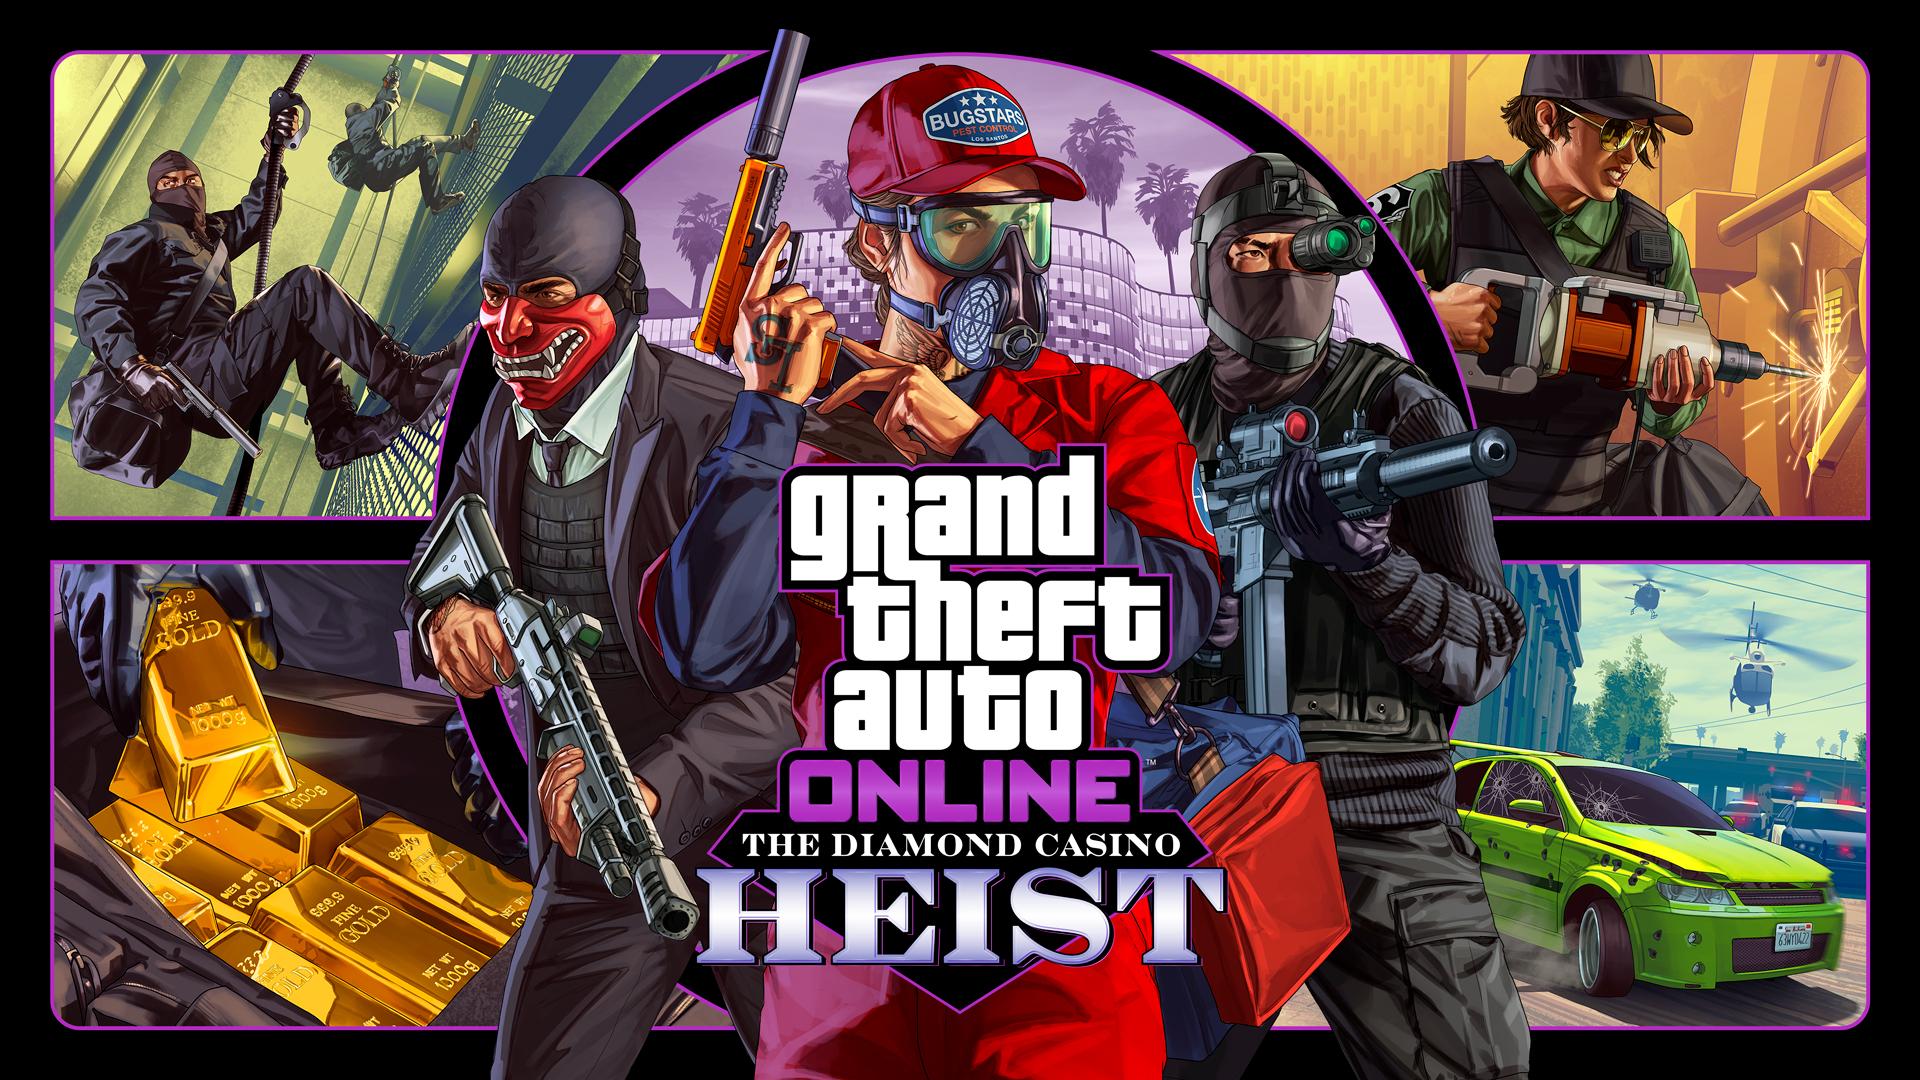 gta-online-casino-heist.jpg